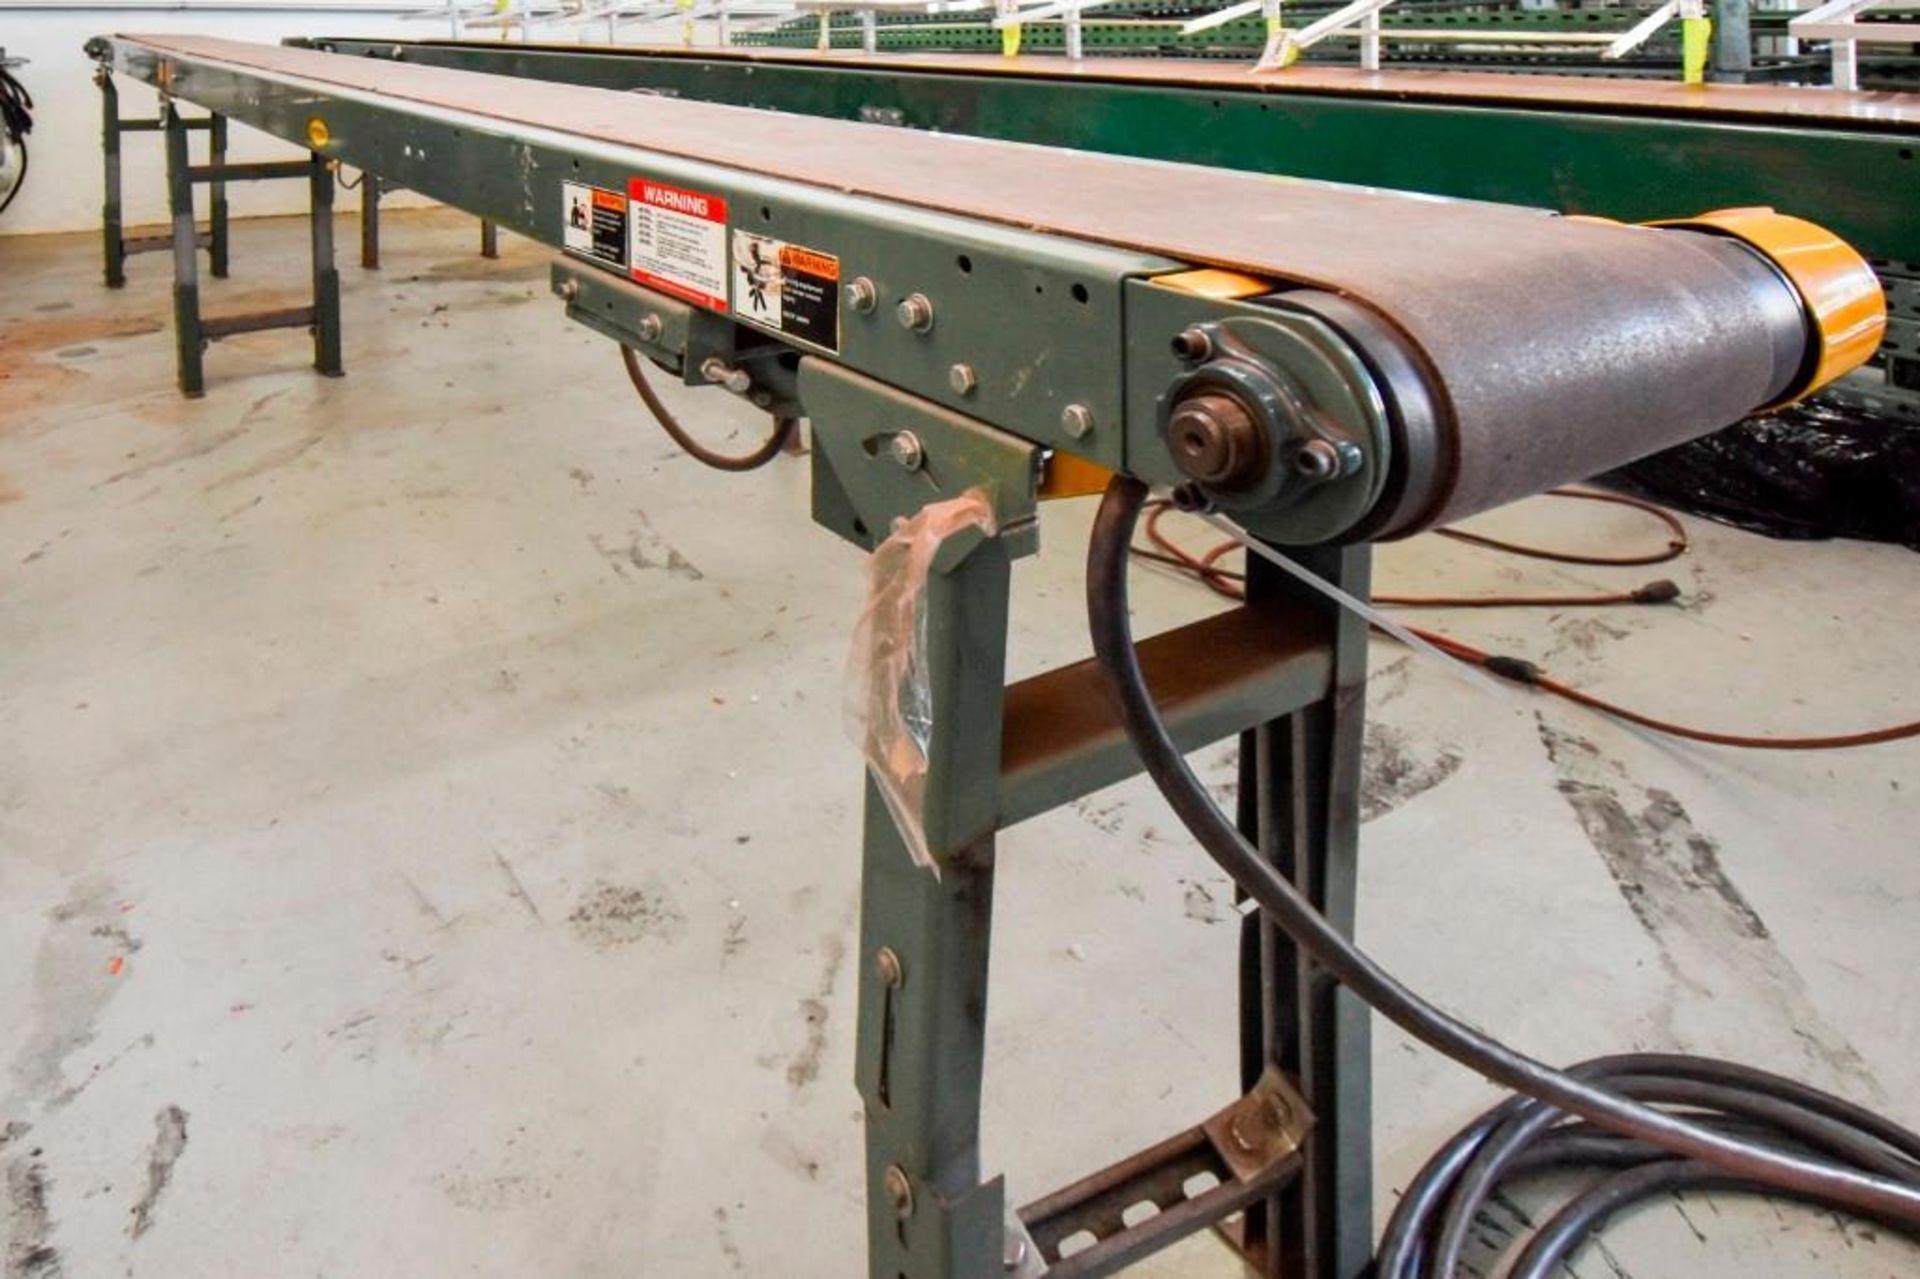 Hytrol Conveyor - Image 10 of 10